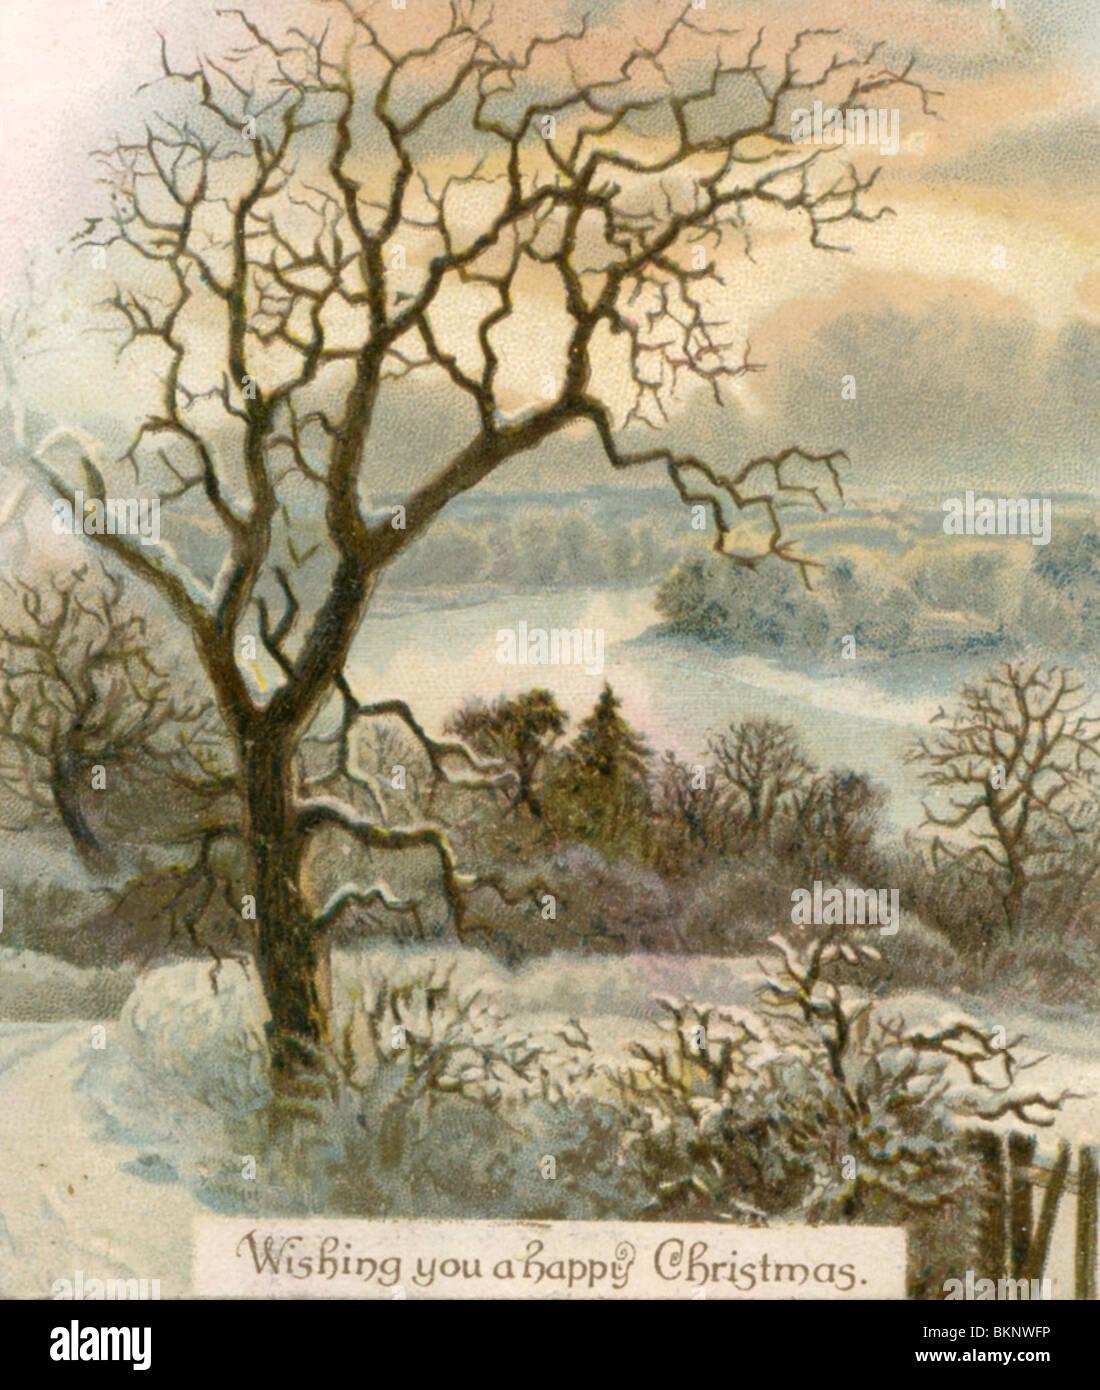 Christmas card scenes stock photos christmas card scenes stock wishing you a happy christmas christmas card showing a wintry scene stock image m4hsunfo